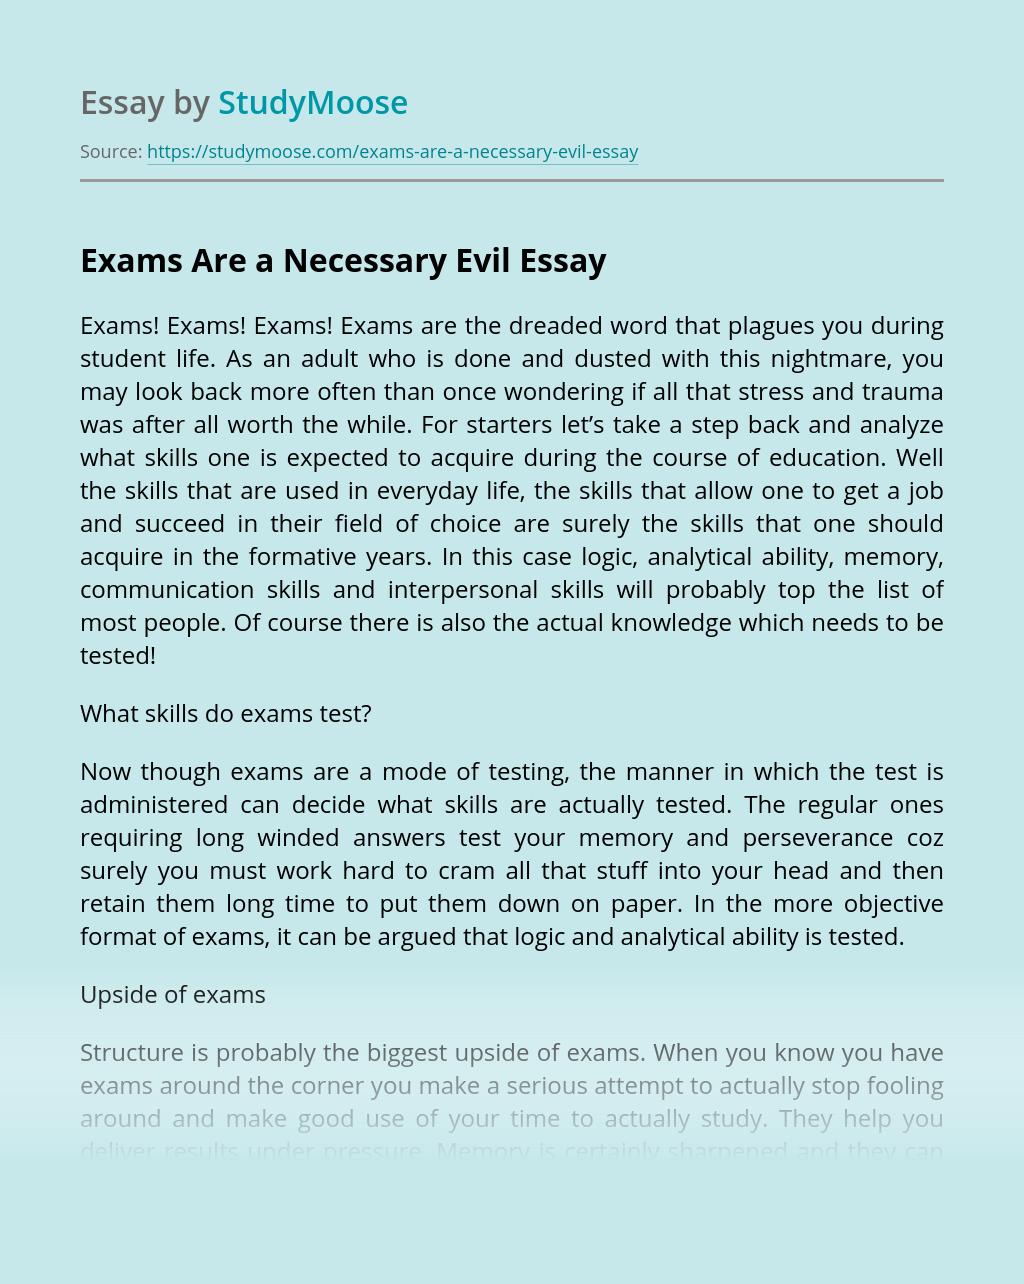 Exams Are a Necessary Evil